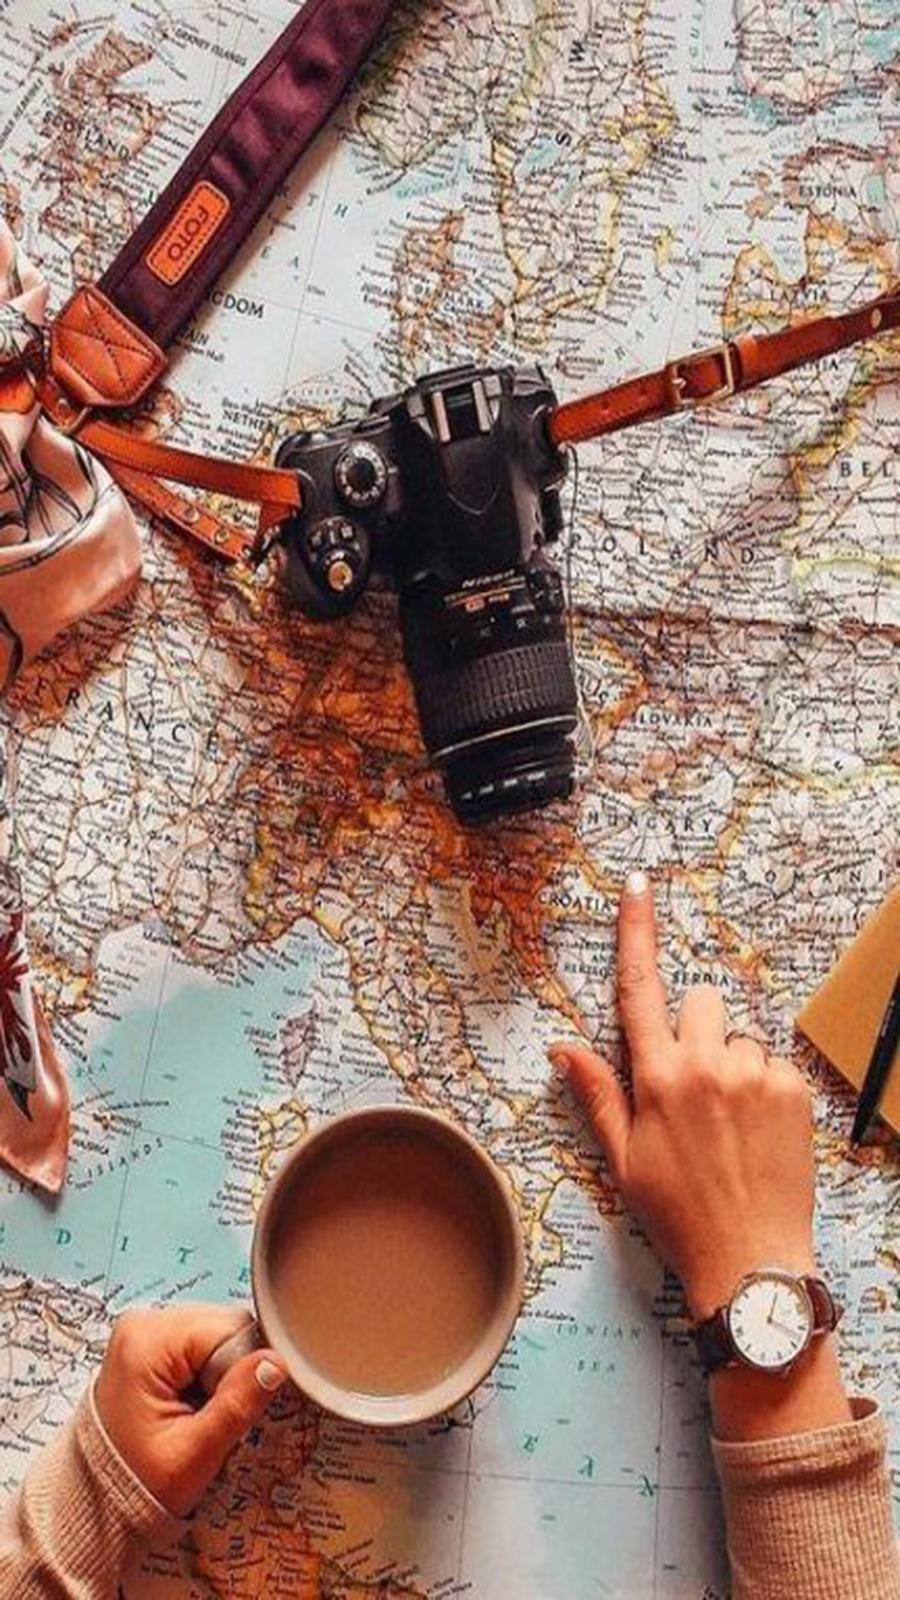 90+ Travel Phone HD Wallpapers Free Download-Bestwallpapers (21)